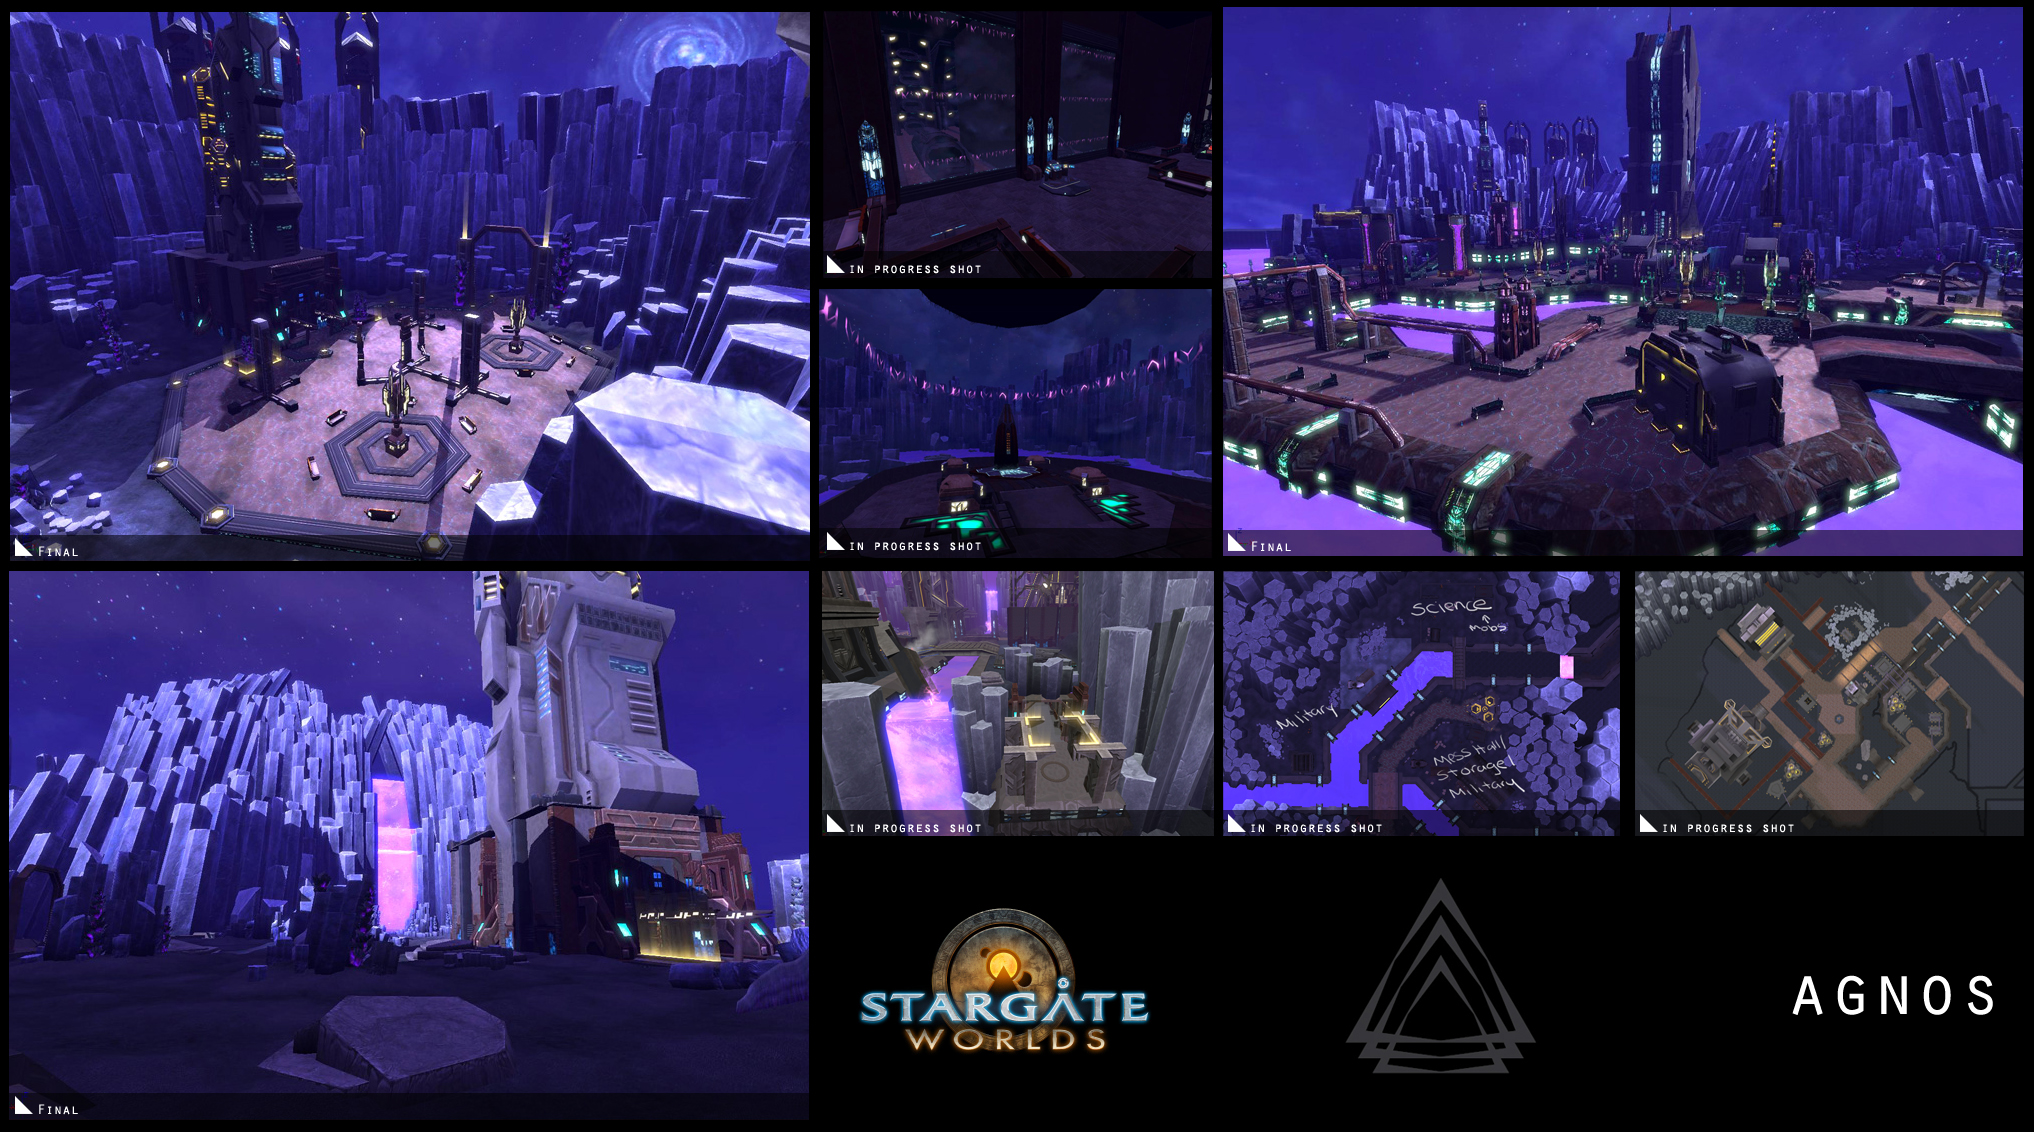 SGGAMINGINFO New Stargate Worlds Images